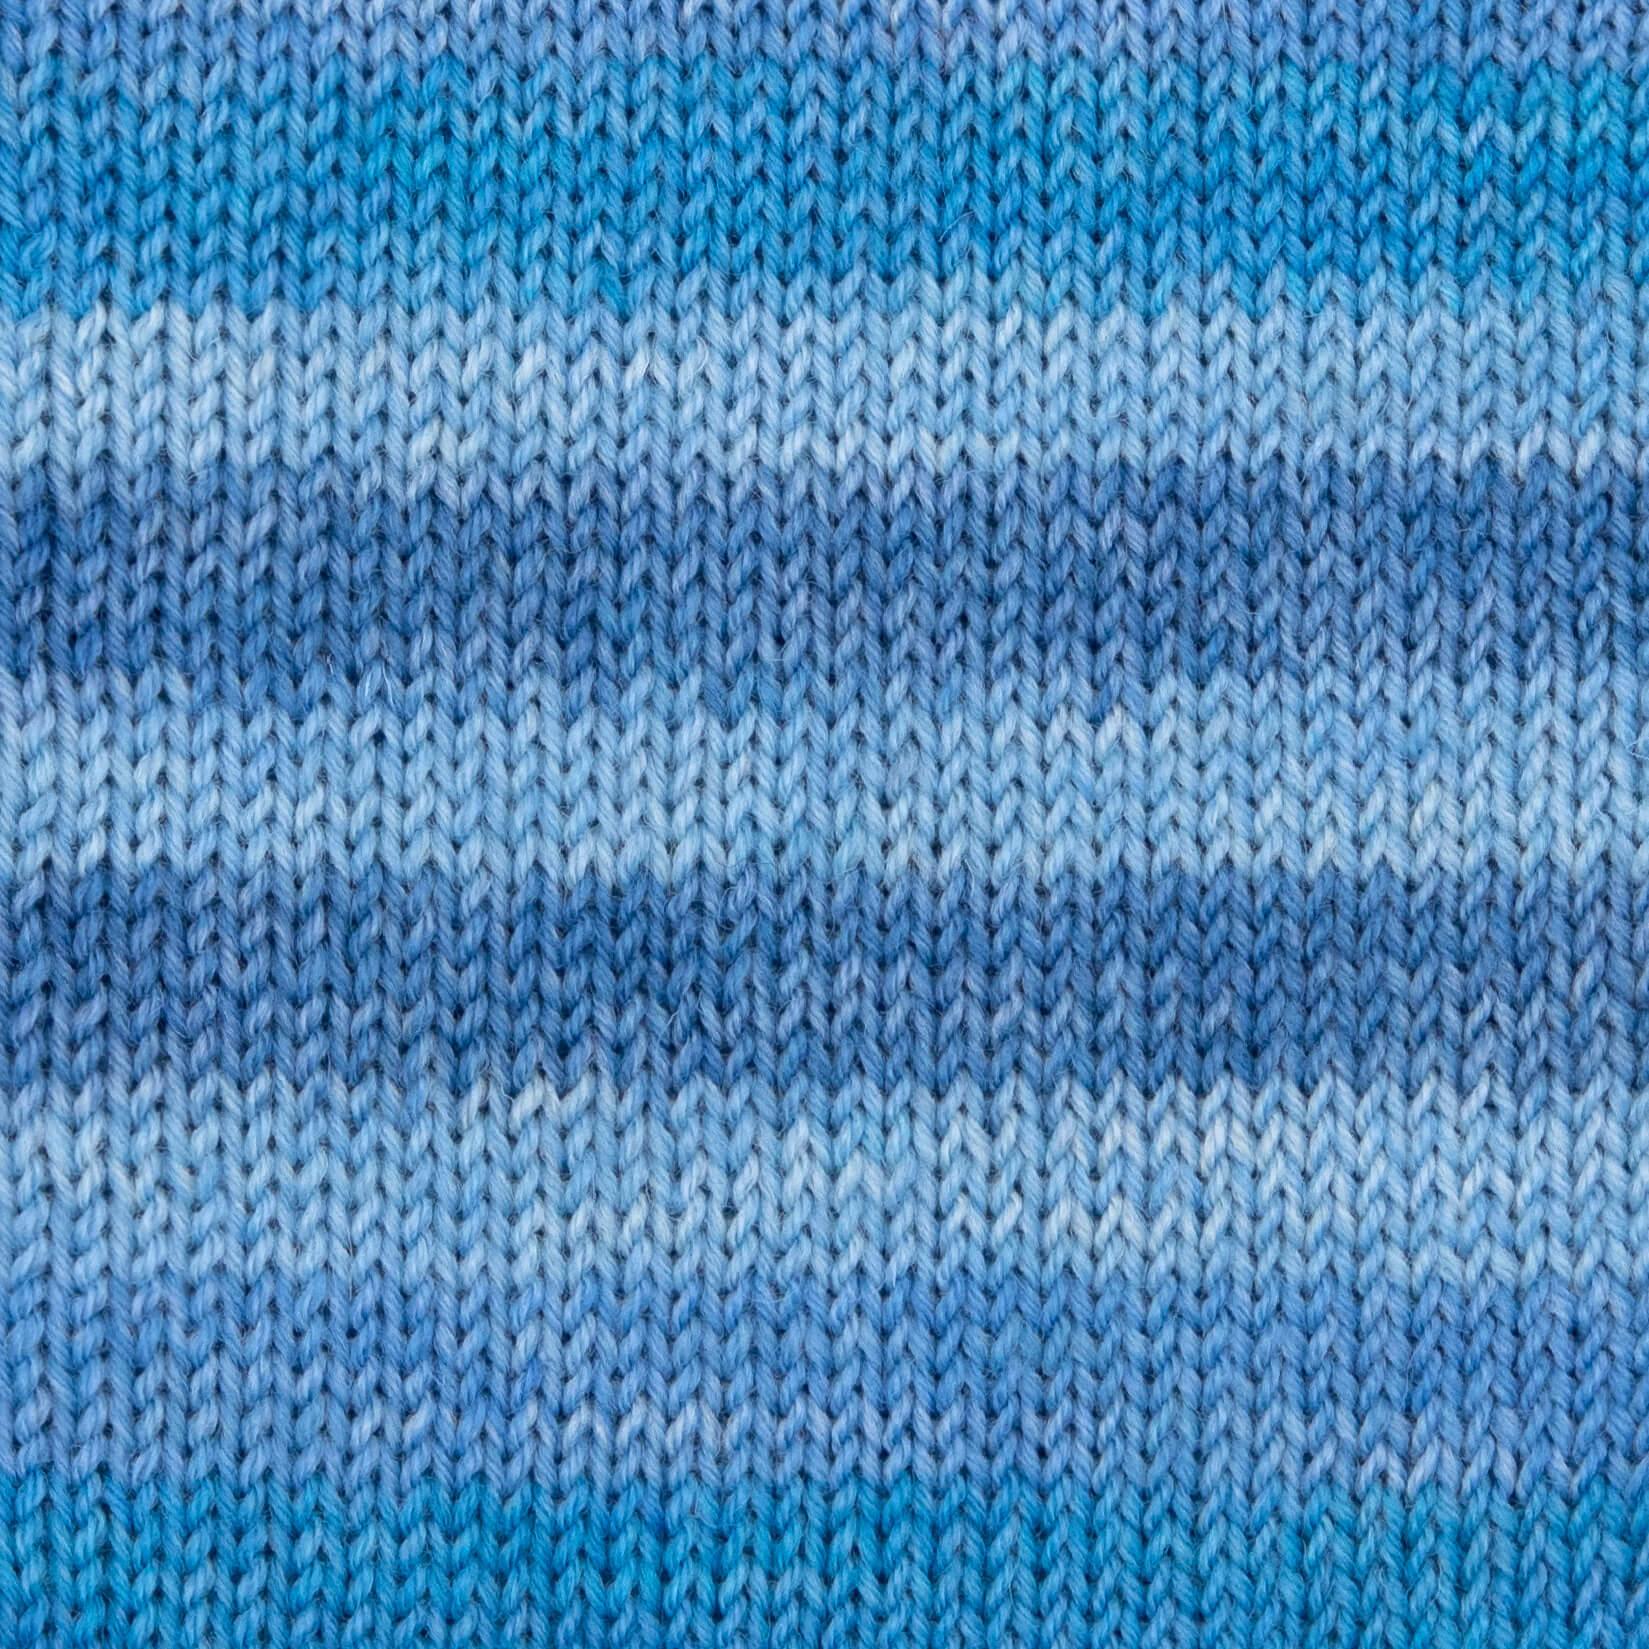 hellblau-blau-meliert